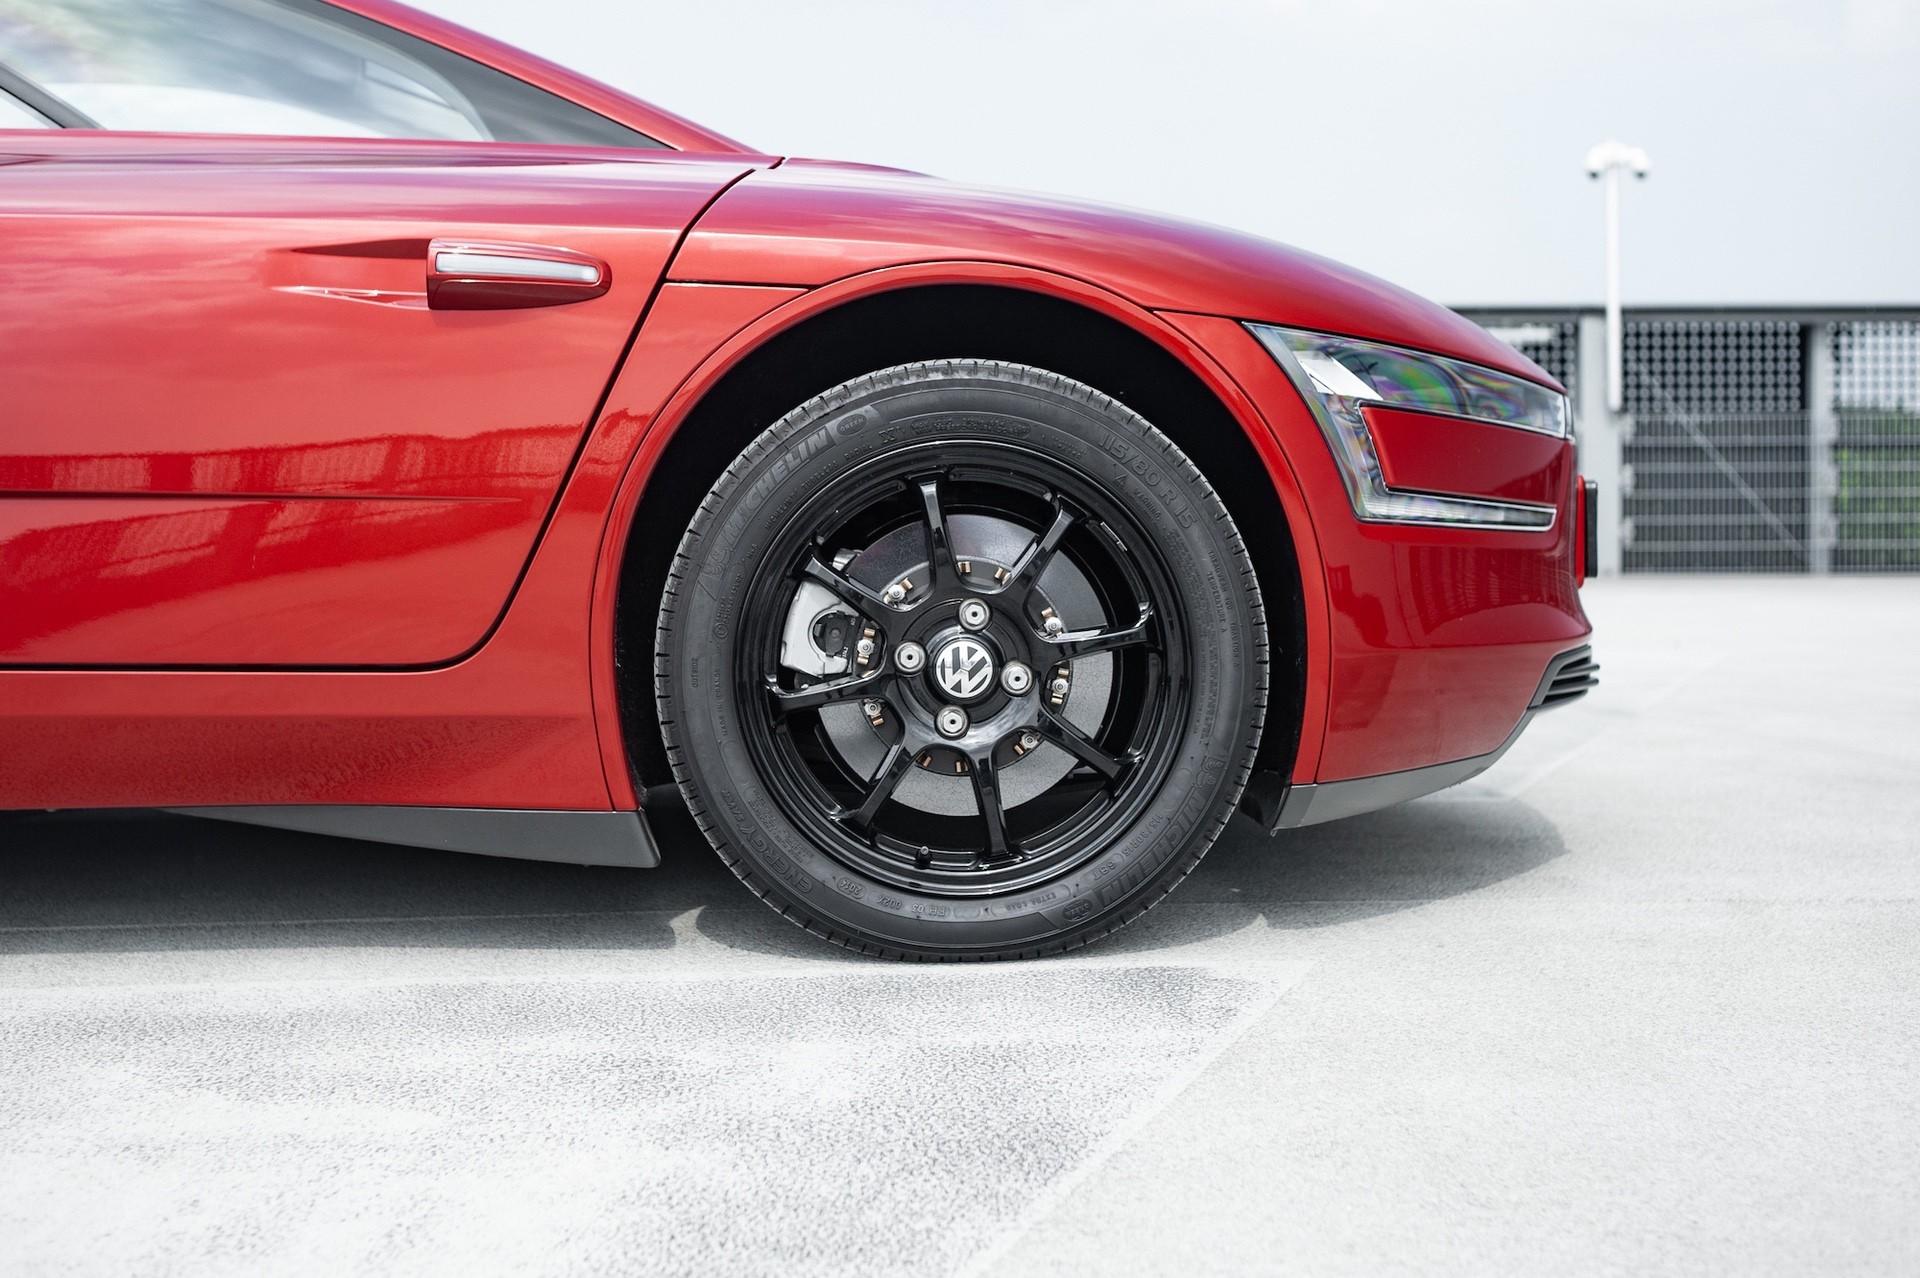 Volkswagen_XL1_sale-0028